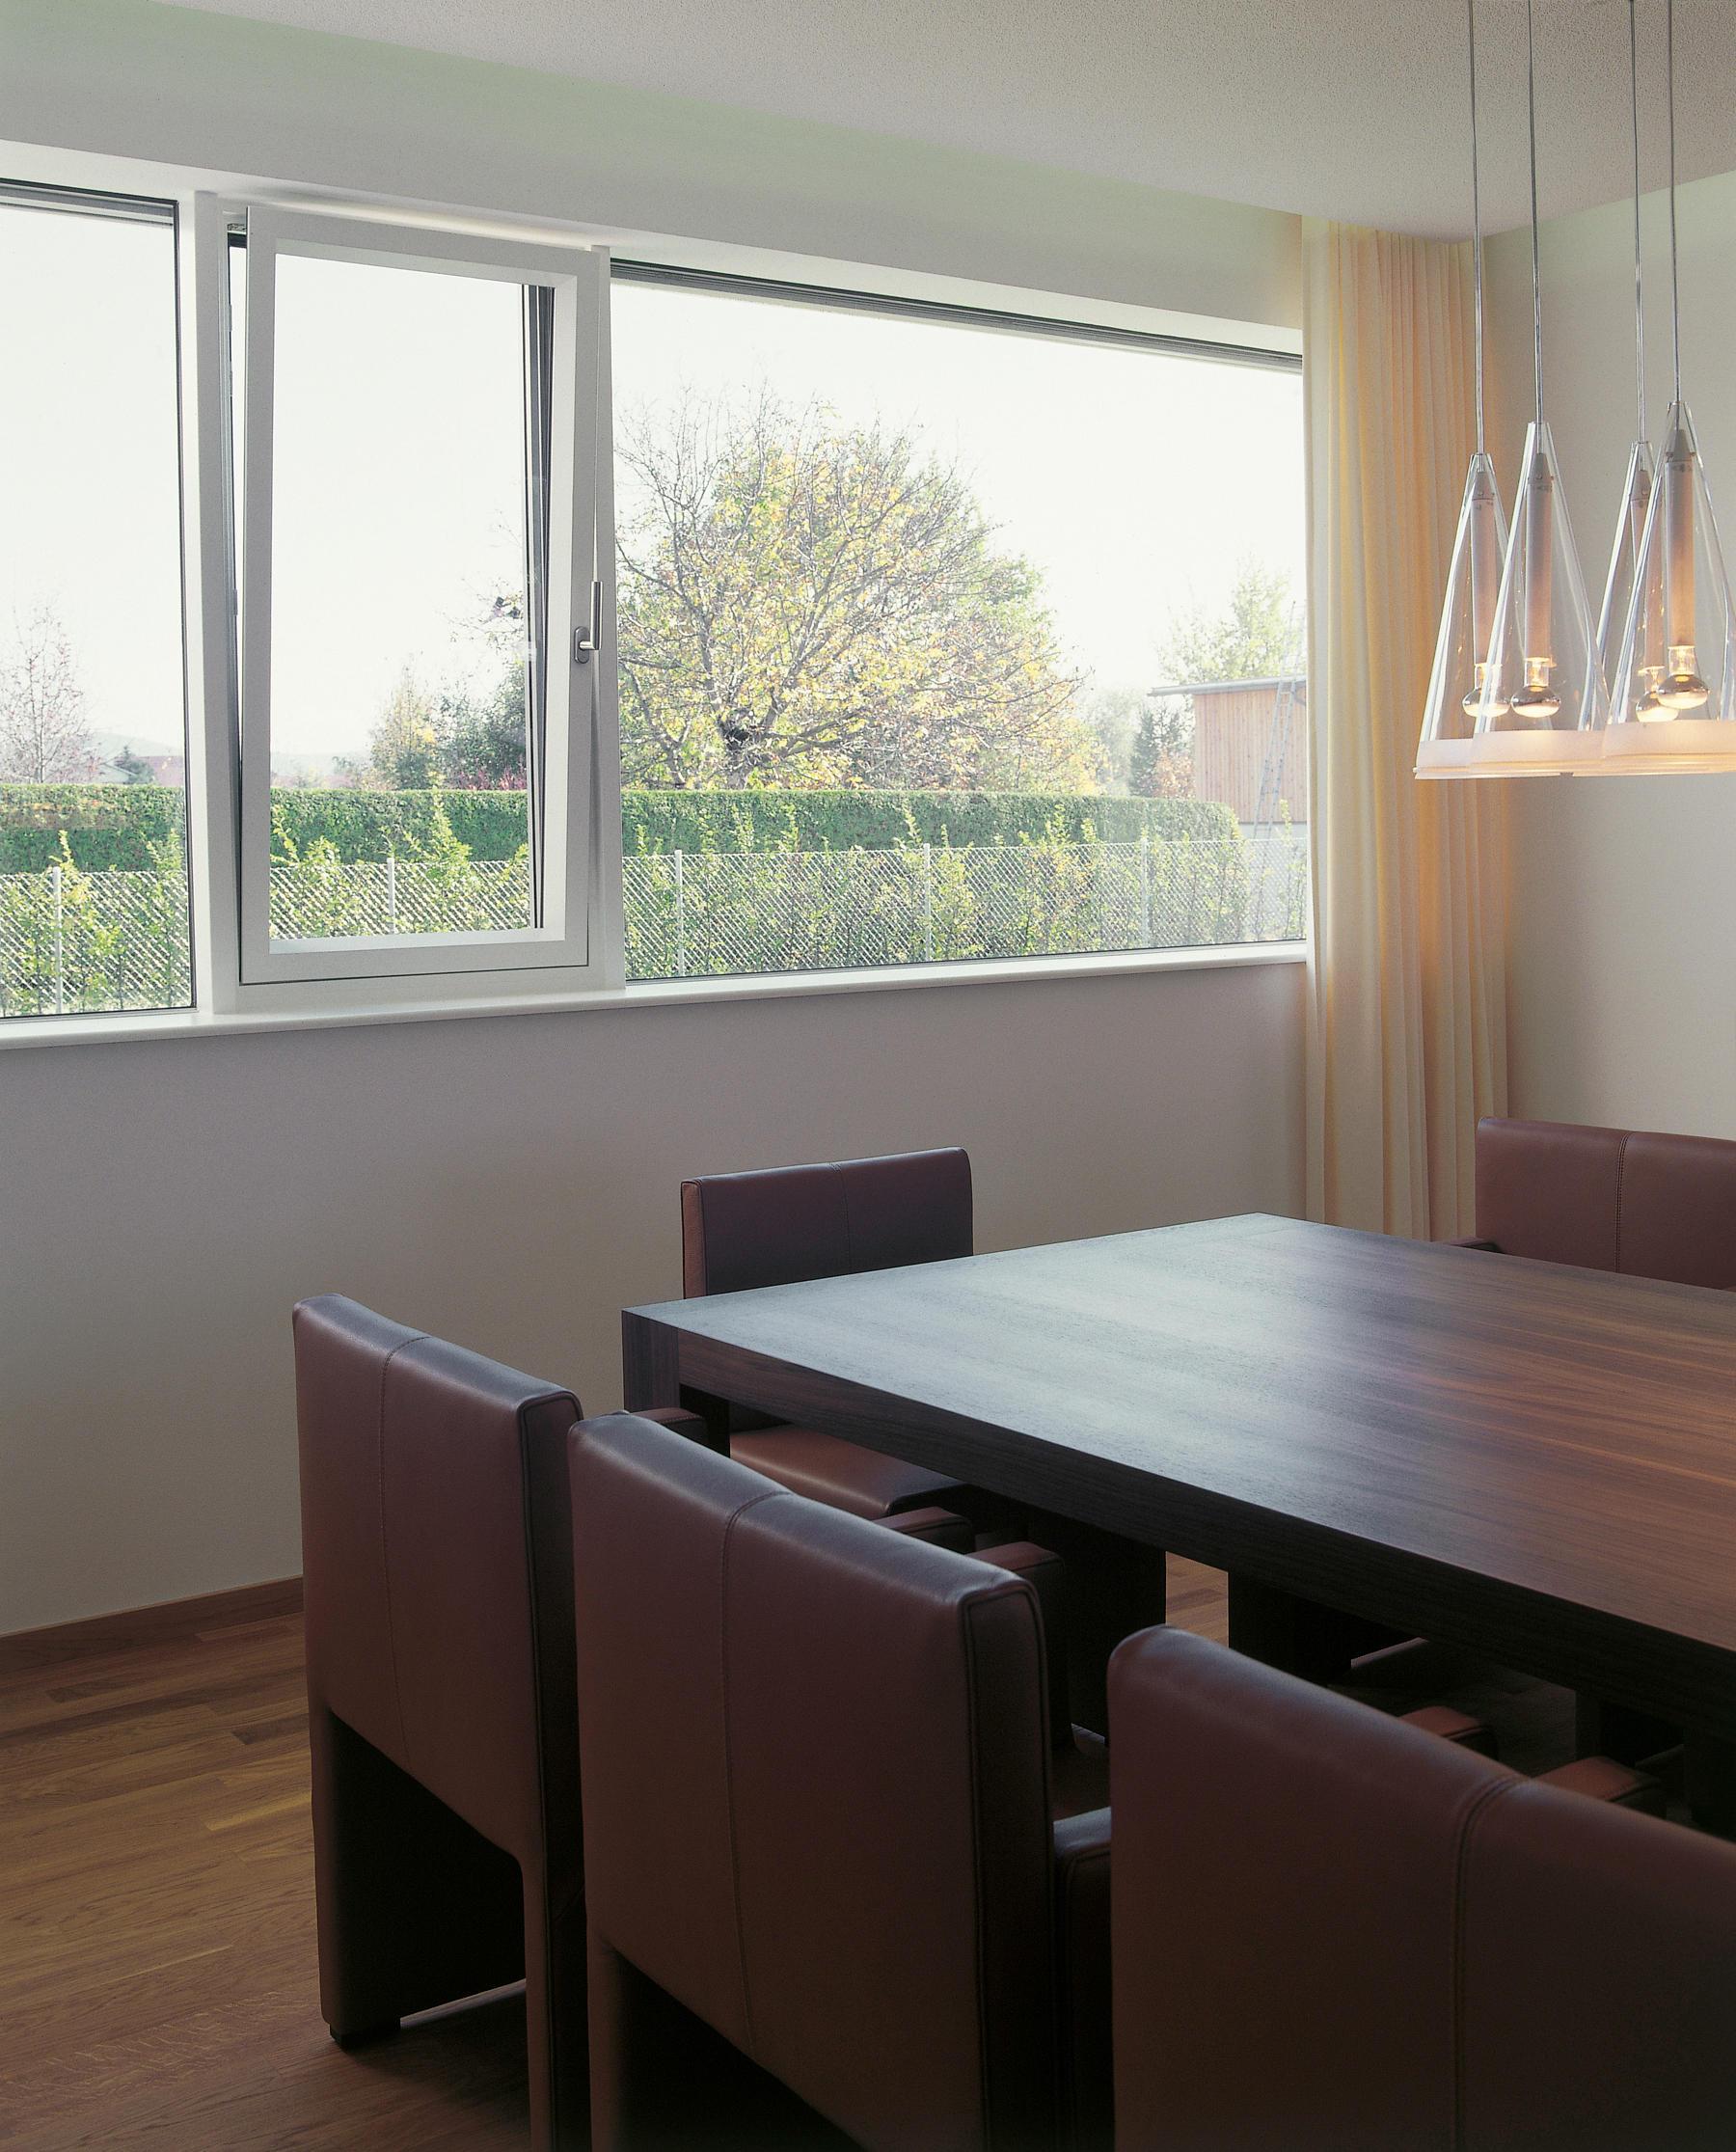 platin 82 fenstertypen von josko architonic. Black Bedroom Furniture Sets. Home Design Ideas